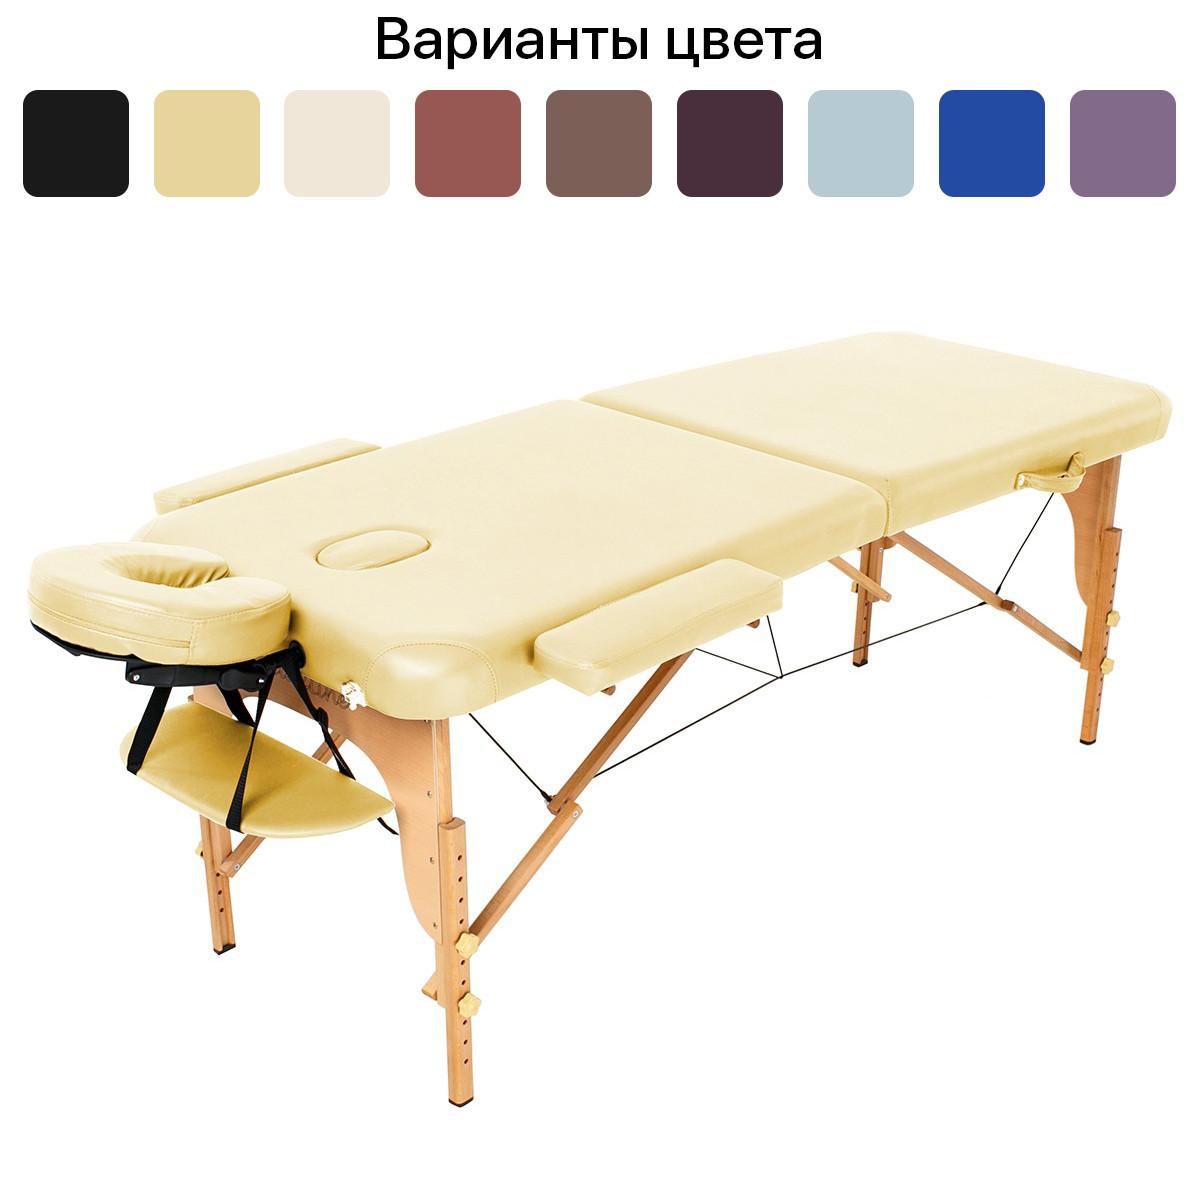 Массажный стол деревянный 2-х сегментный RelaxLine Bali кушетка массажная (дерев'яний масажний стіл) Бежевый